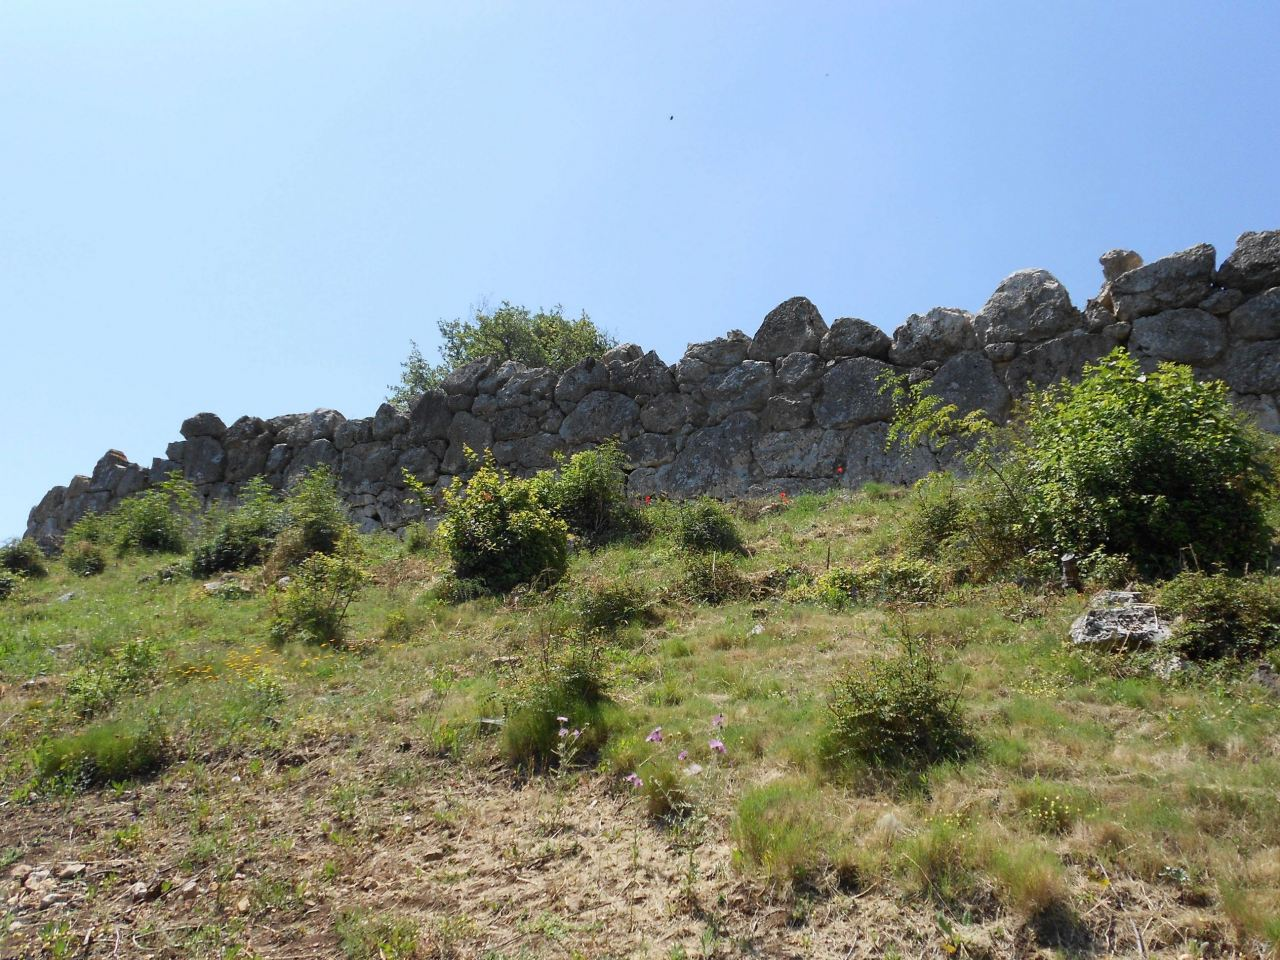 Roselle-Mura-Megalitiche-Roselle-Grosseto-Toscana-Italia-31